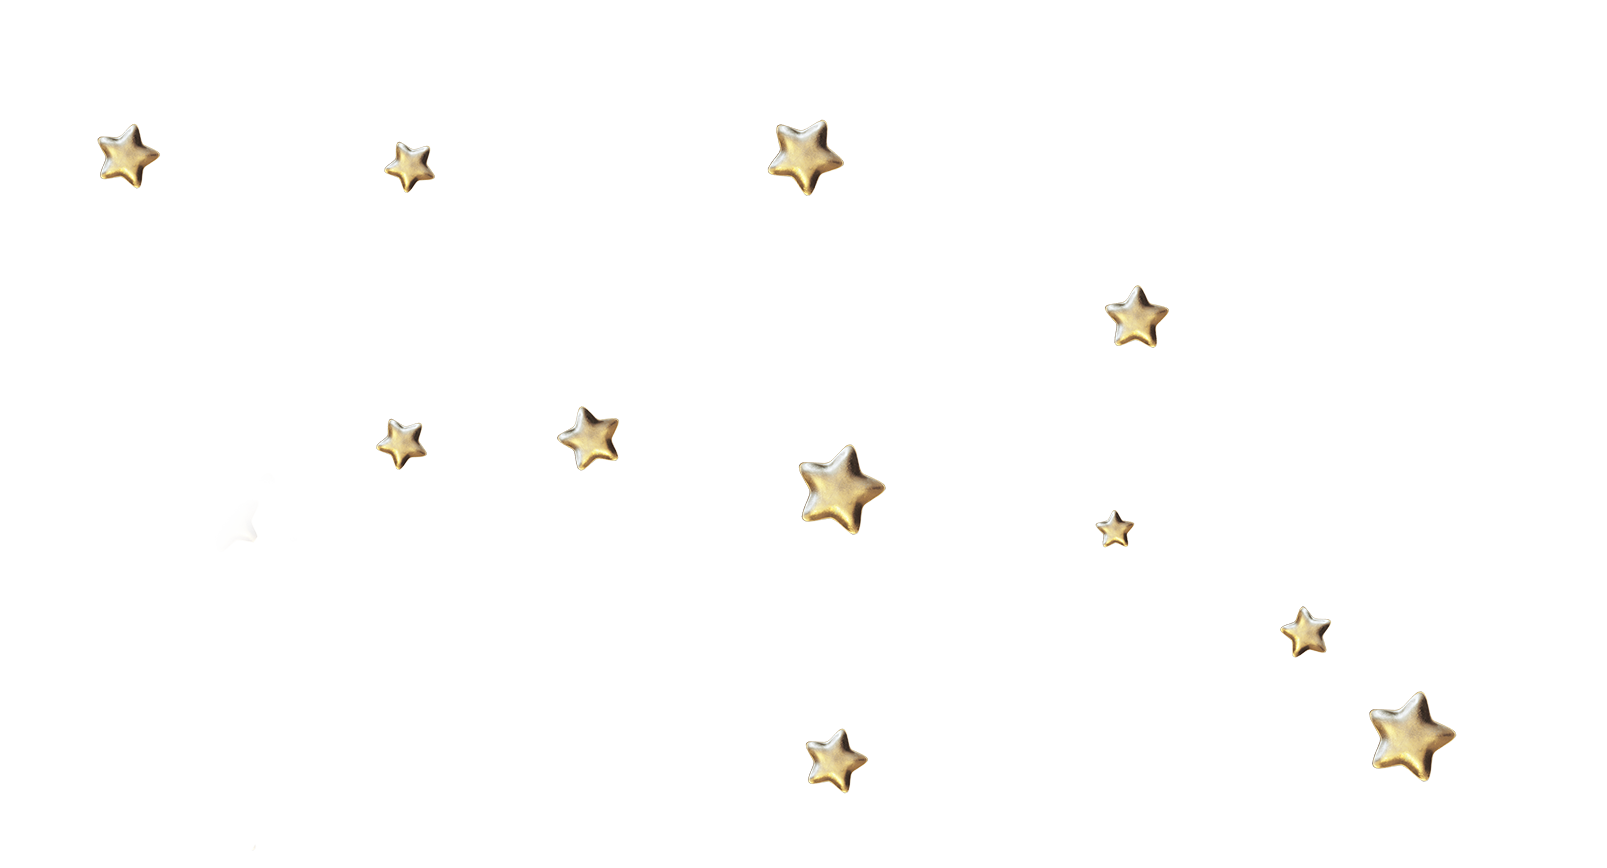 Star PNG Images Transparent Free Download.